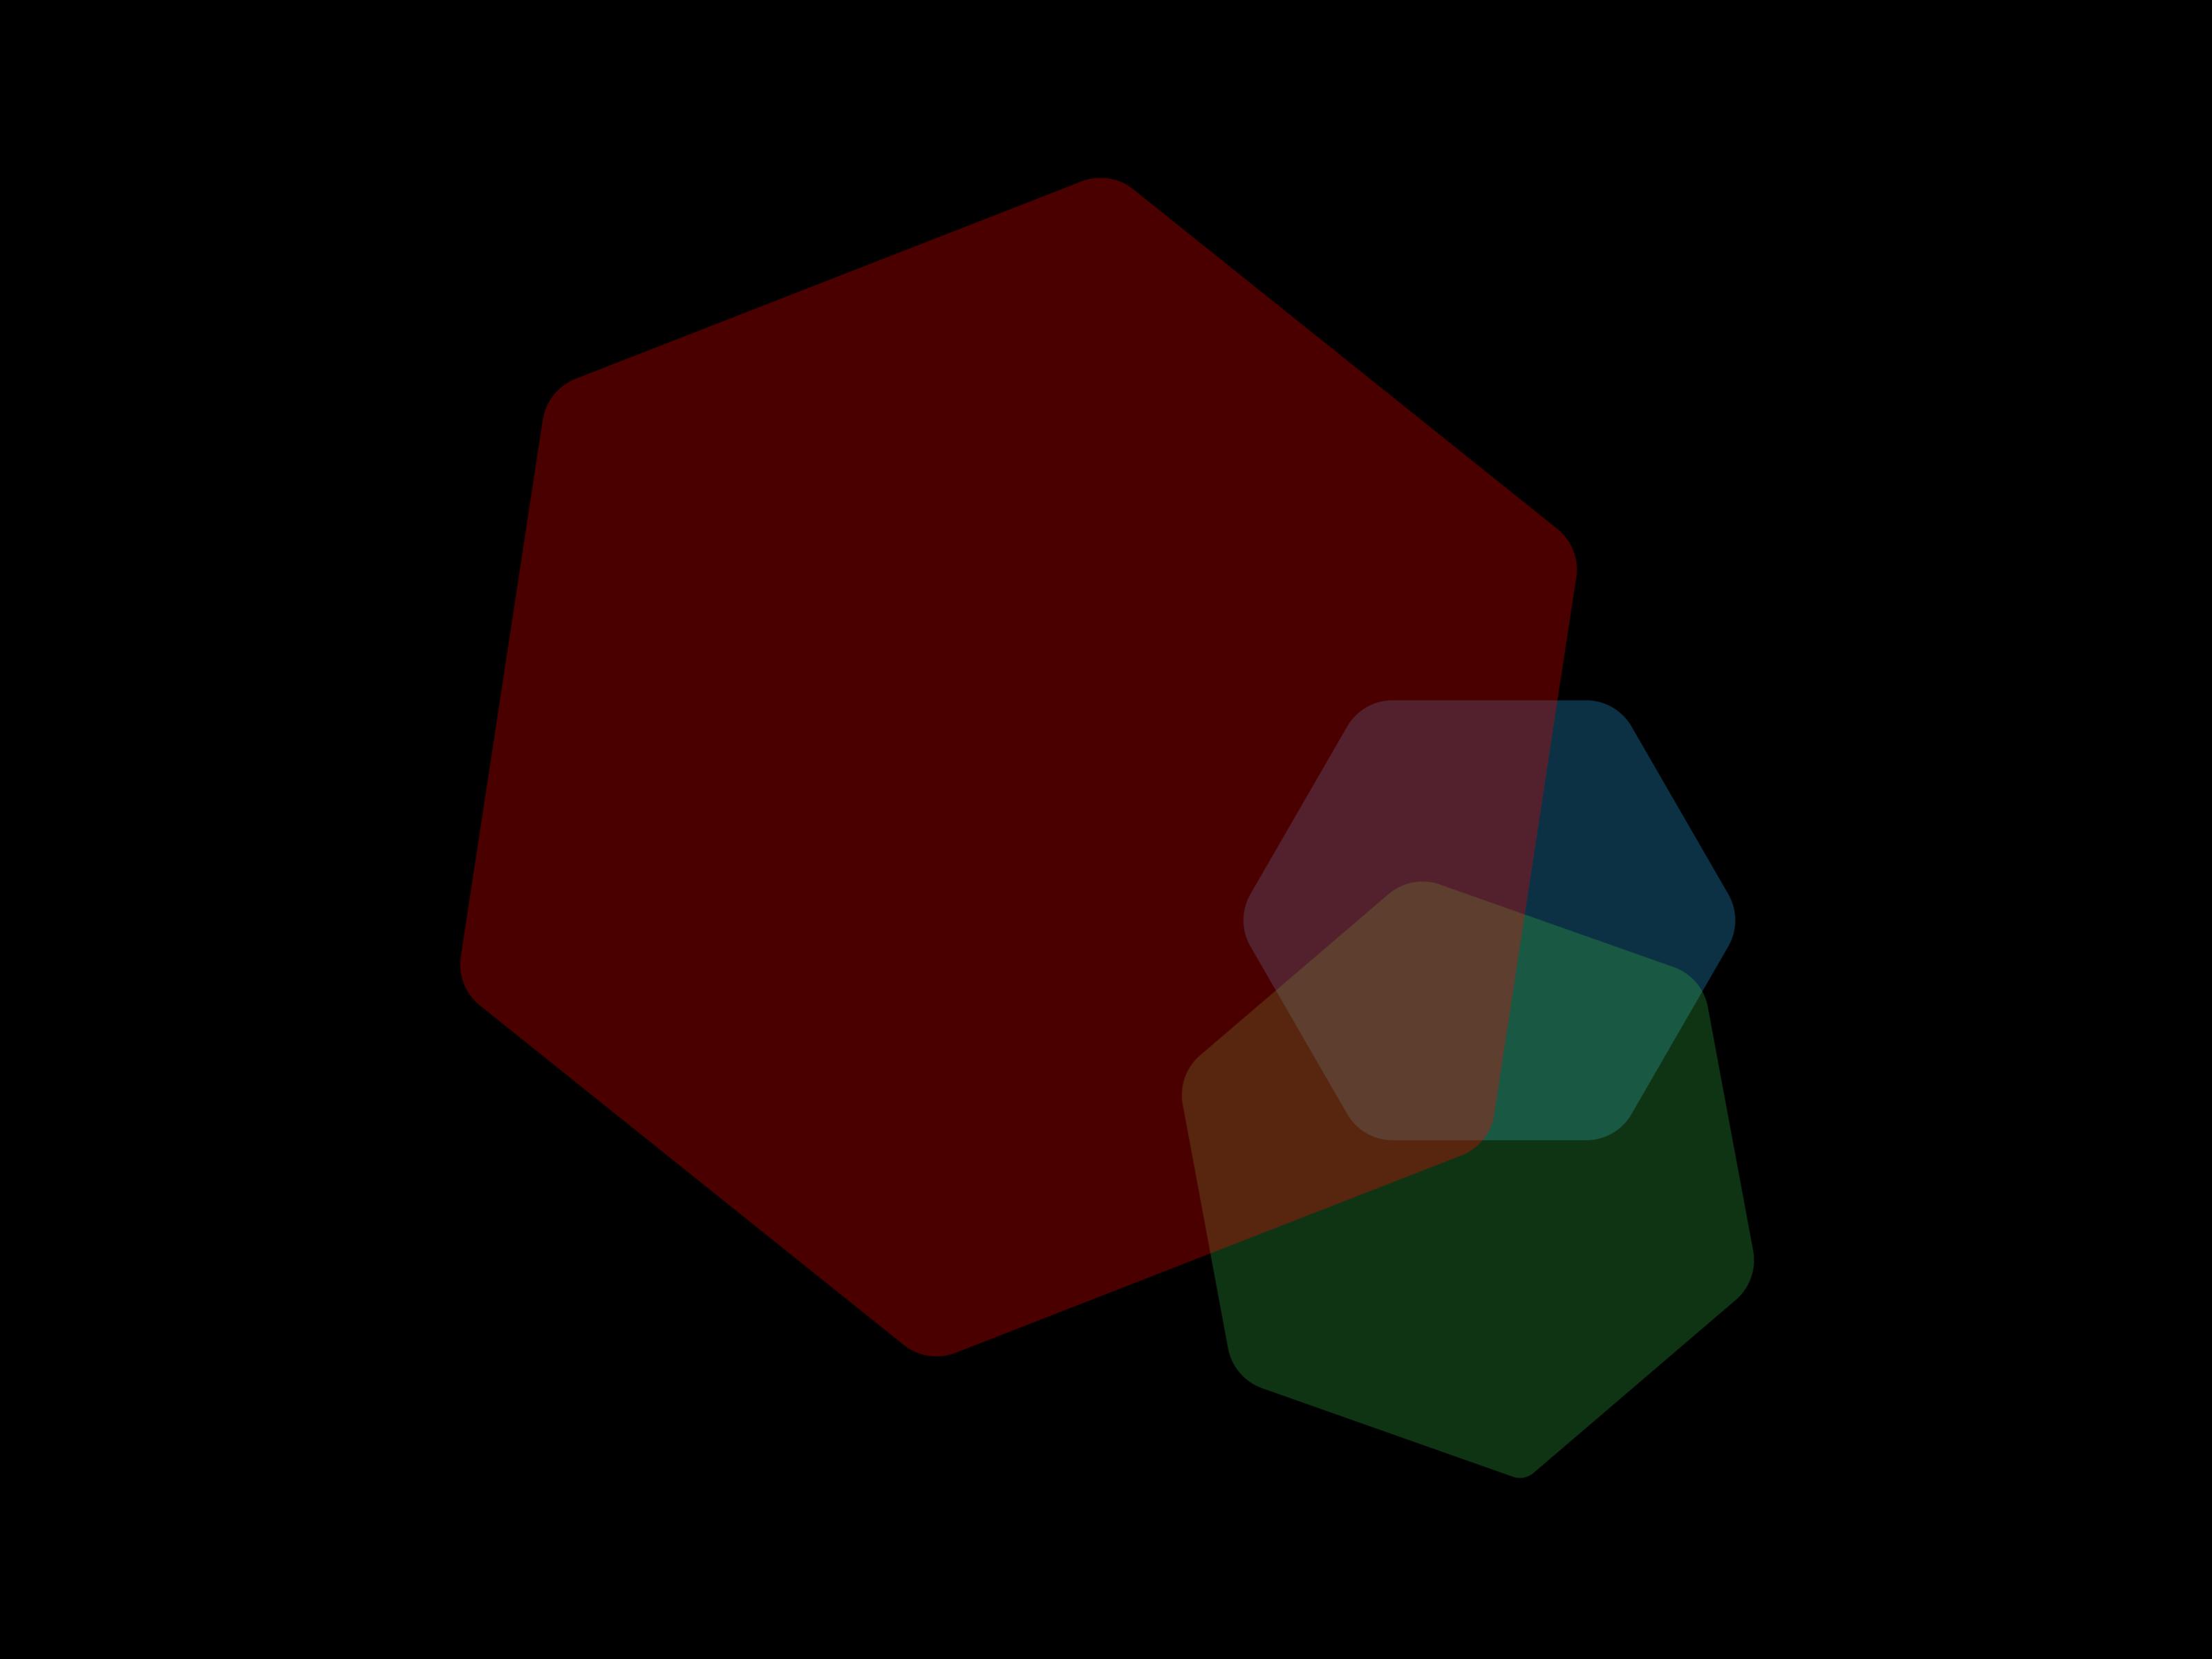 Background image example -  Background To Black Example